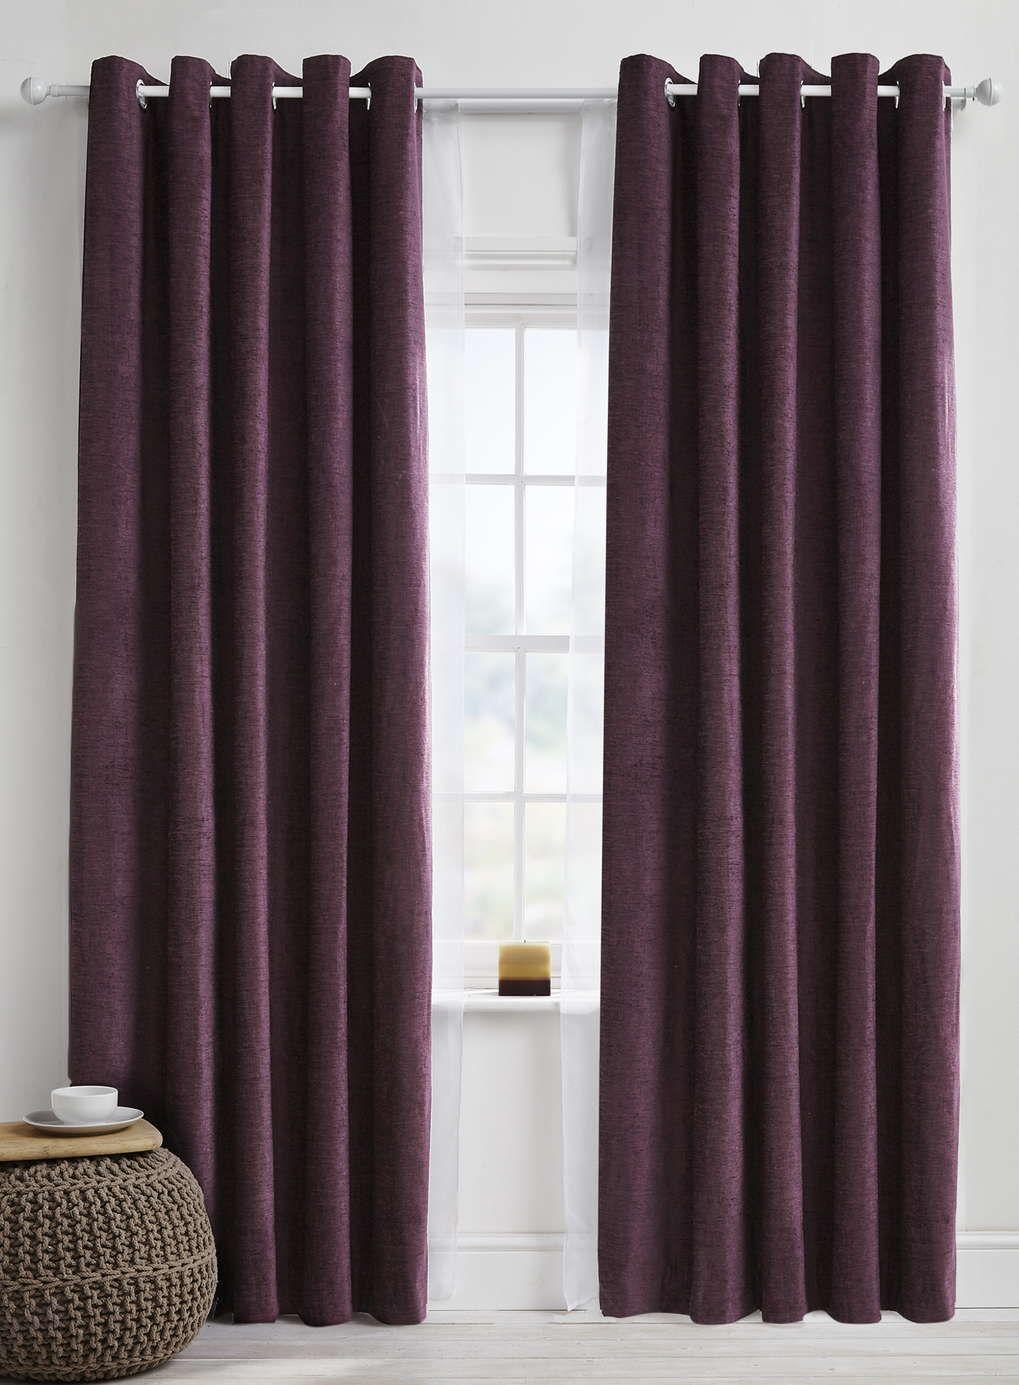 Plum Essentials Chenille Curtain Range BHS Chenille